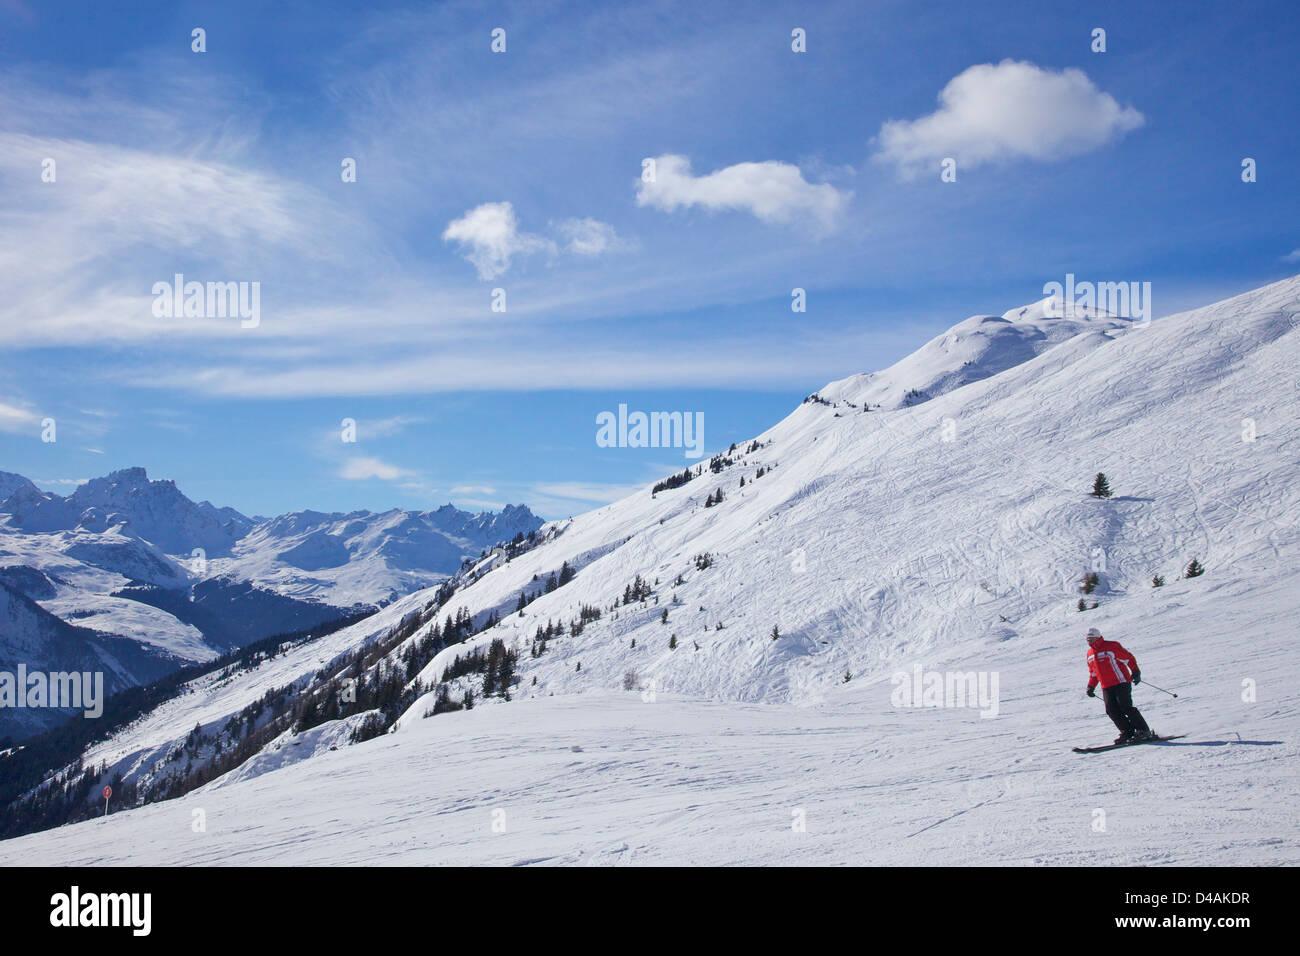 Skiers in winter sunshine, Verdons Sud, La Plagne, France, Europe - Stock Image